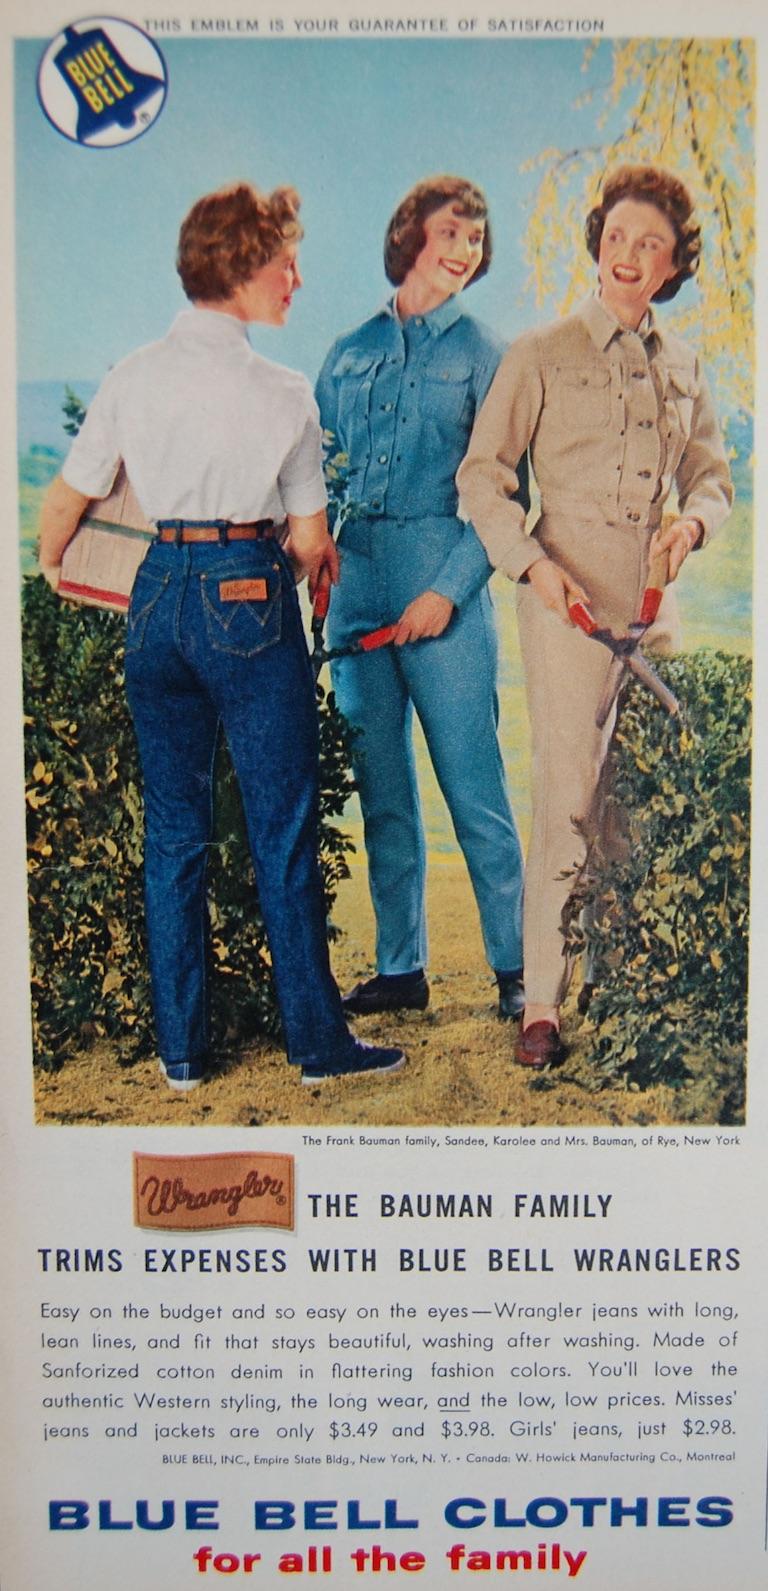 Реклама Blue Bell, середина 1950-х годов